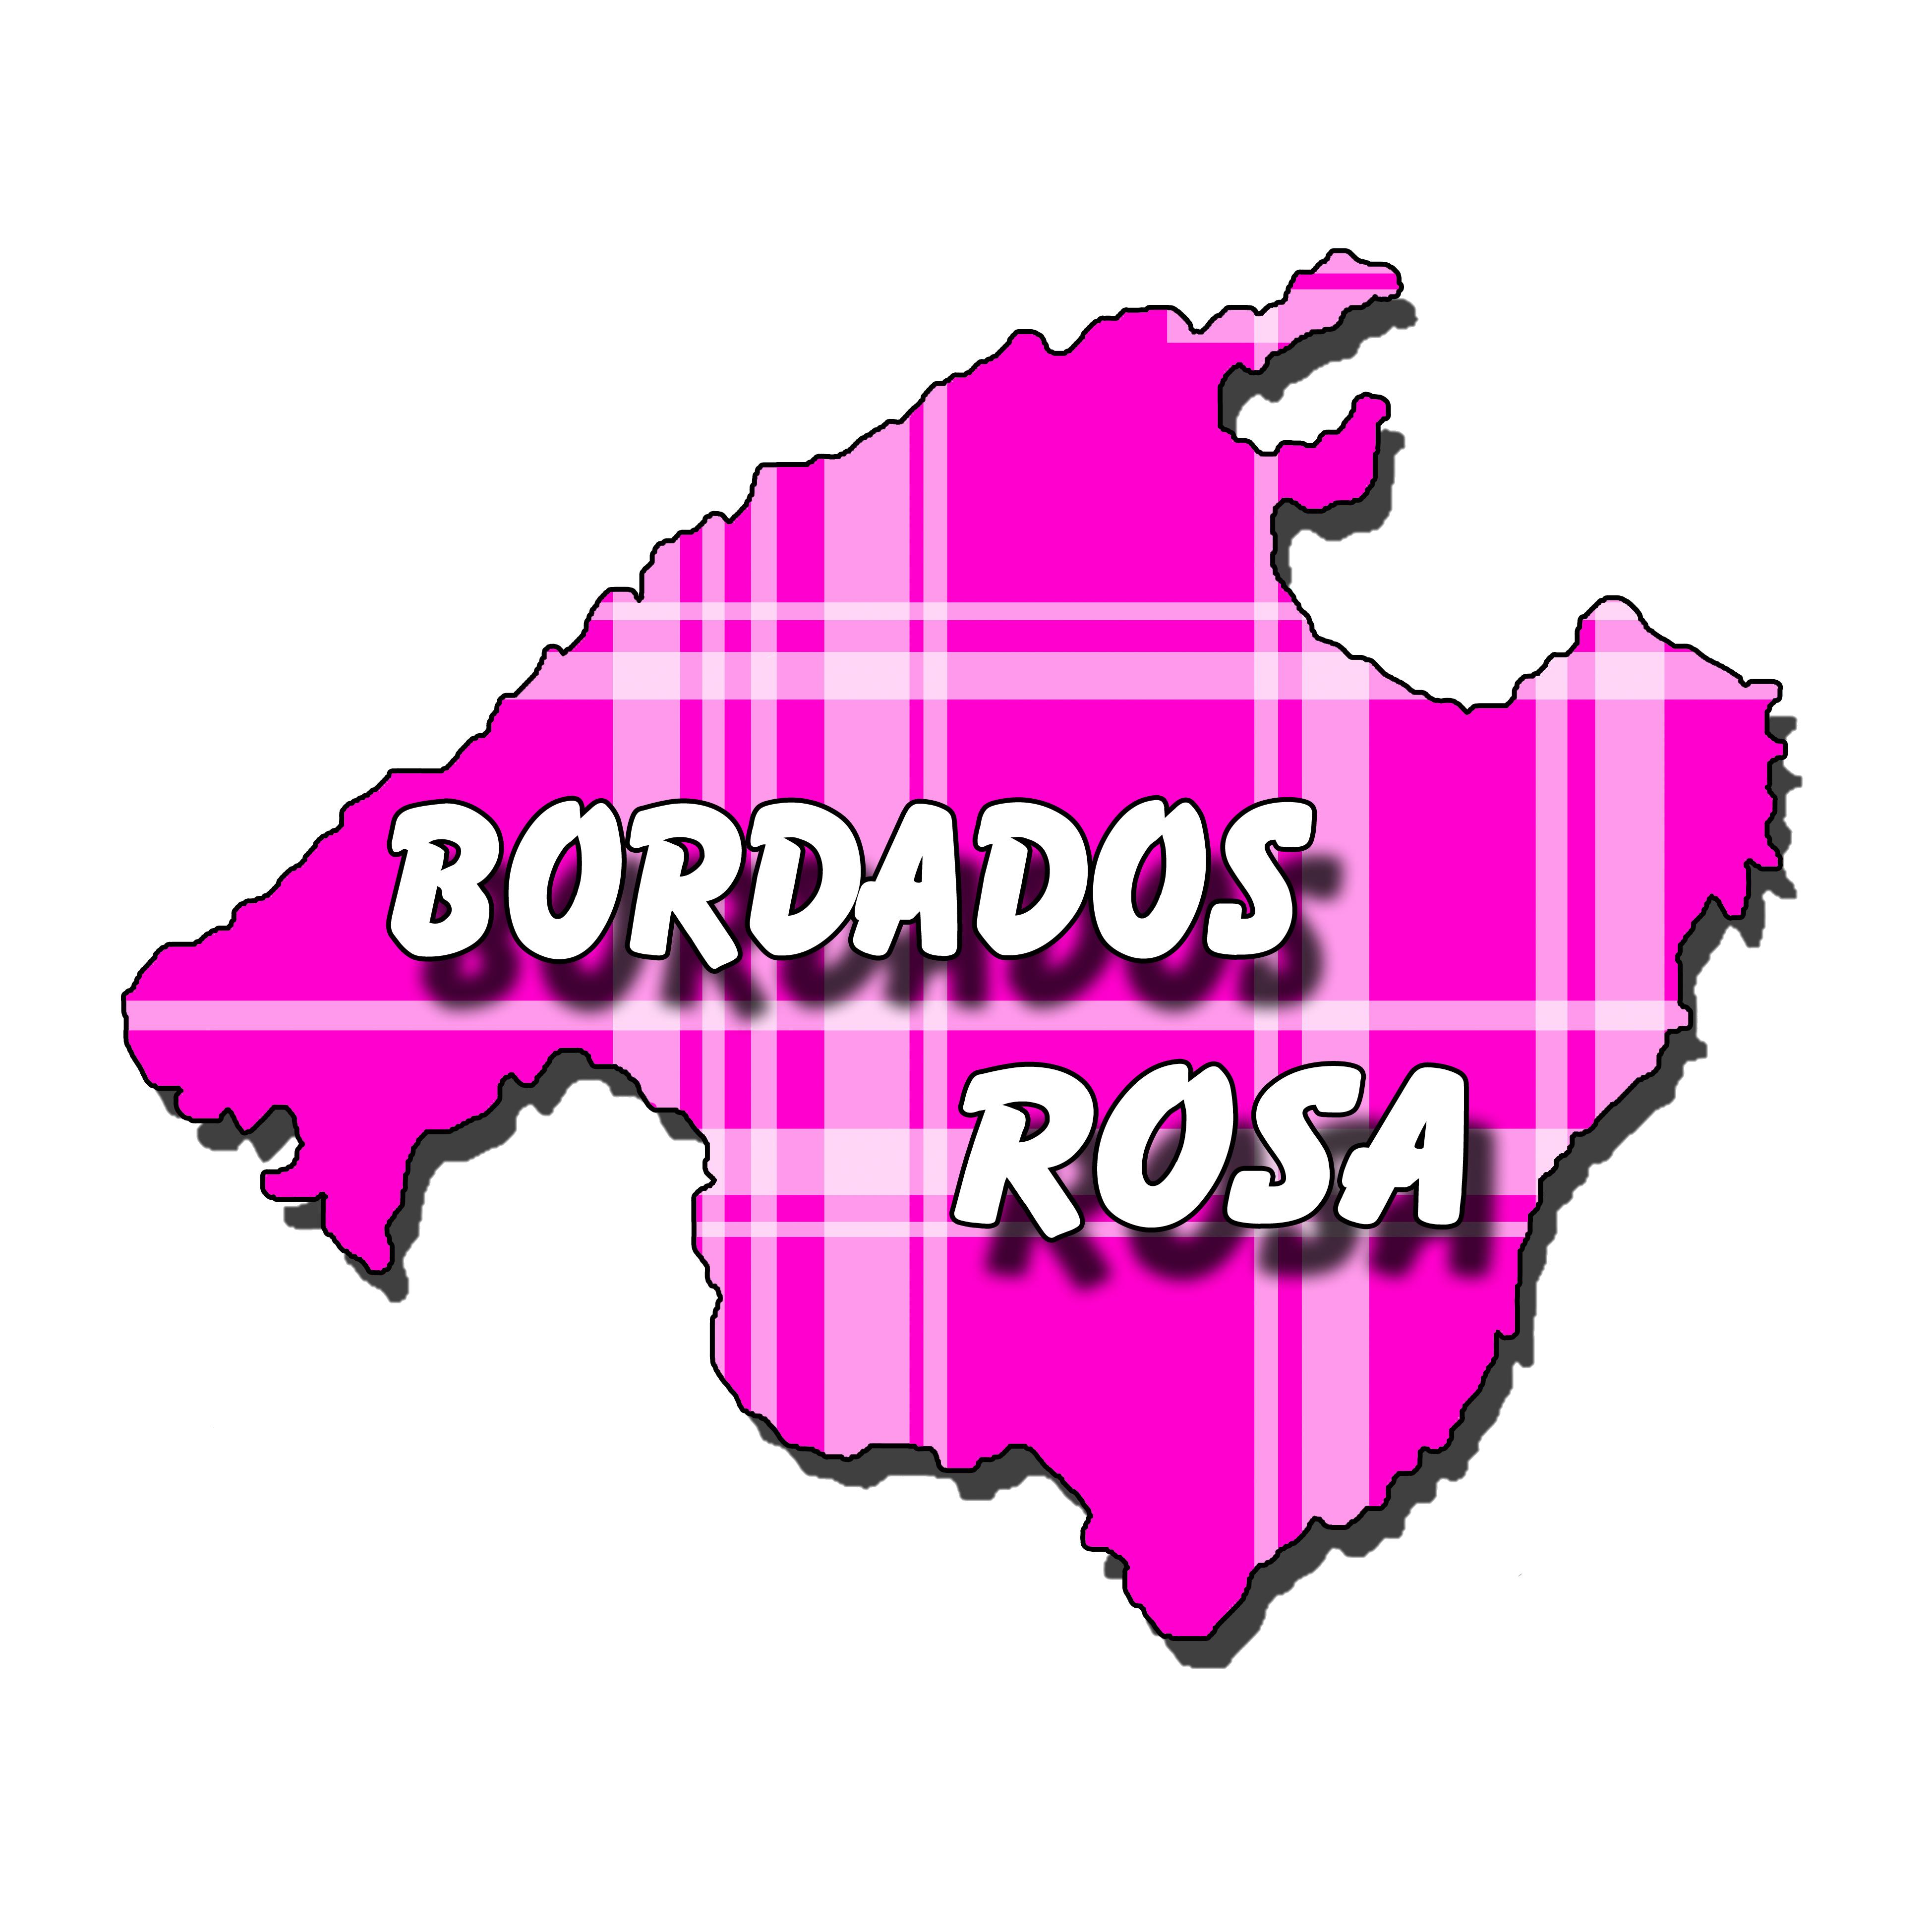 Bordados Rosa logo